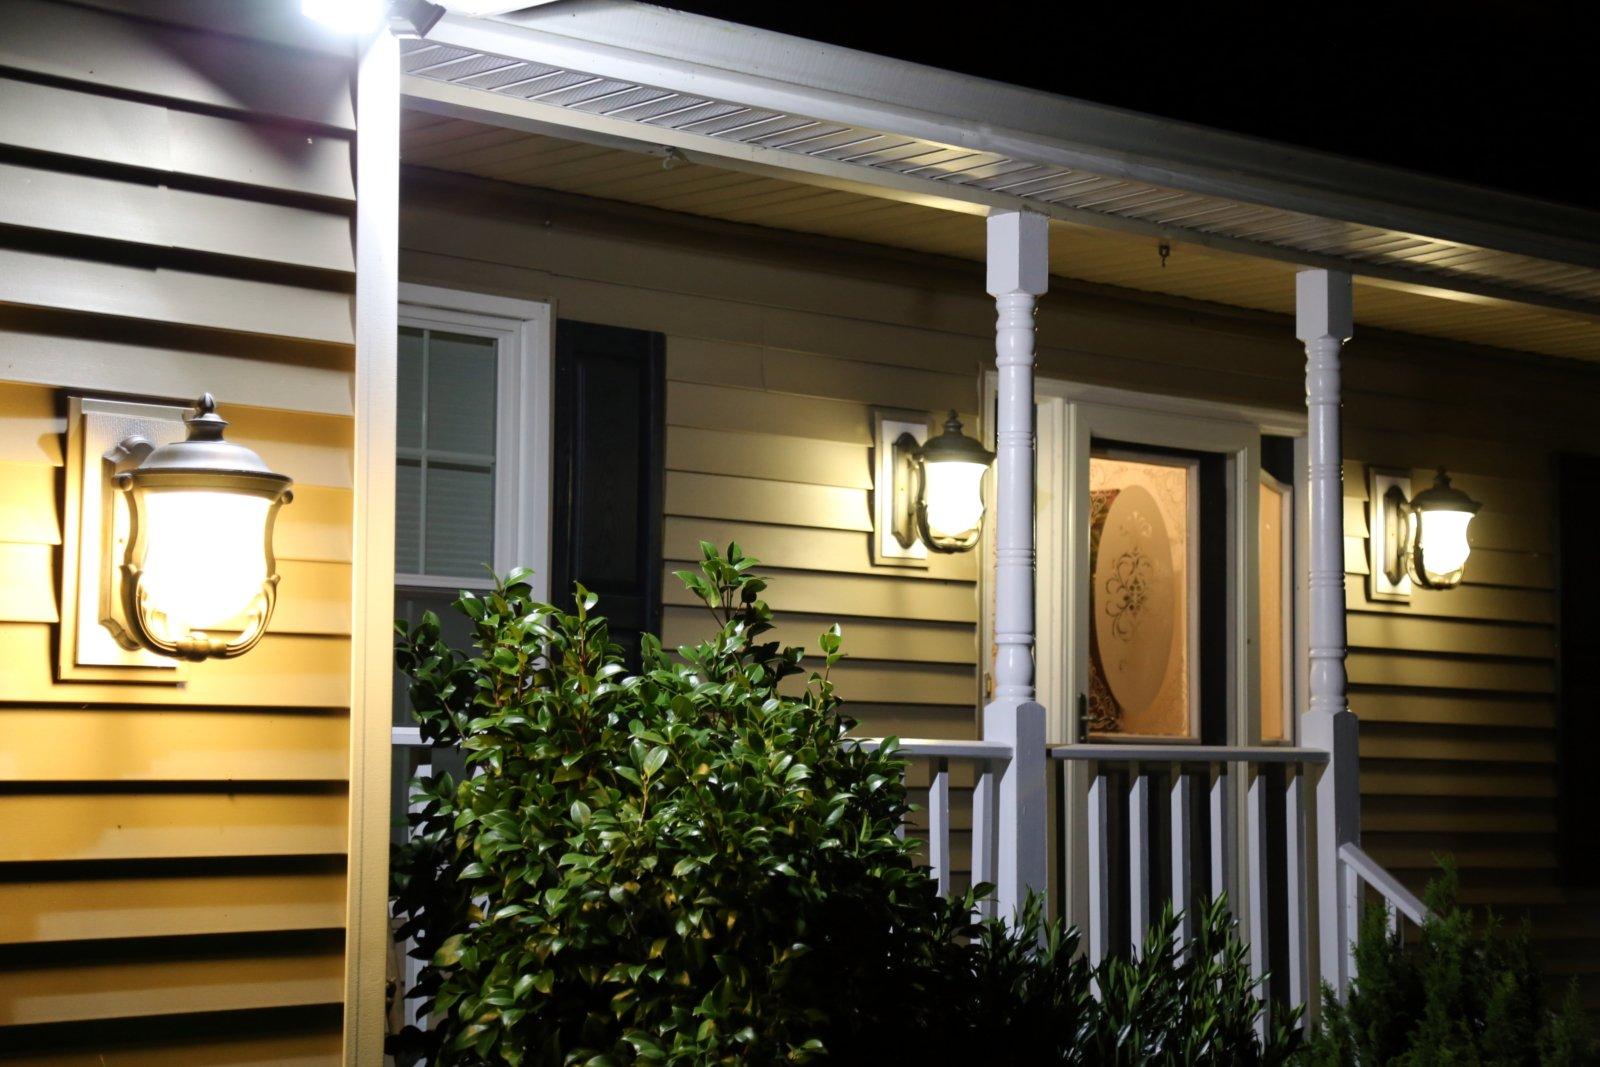 Crofton electricians Outdoor lighting